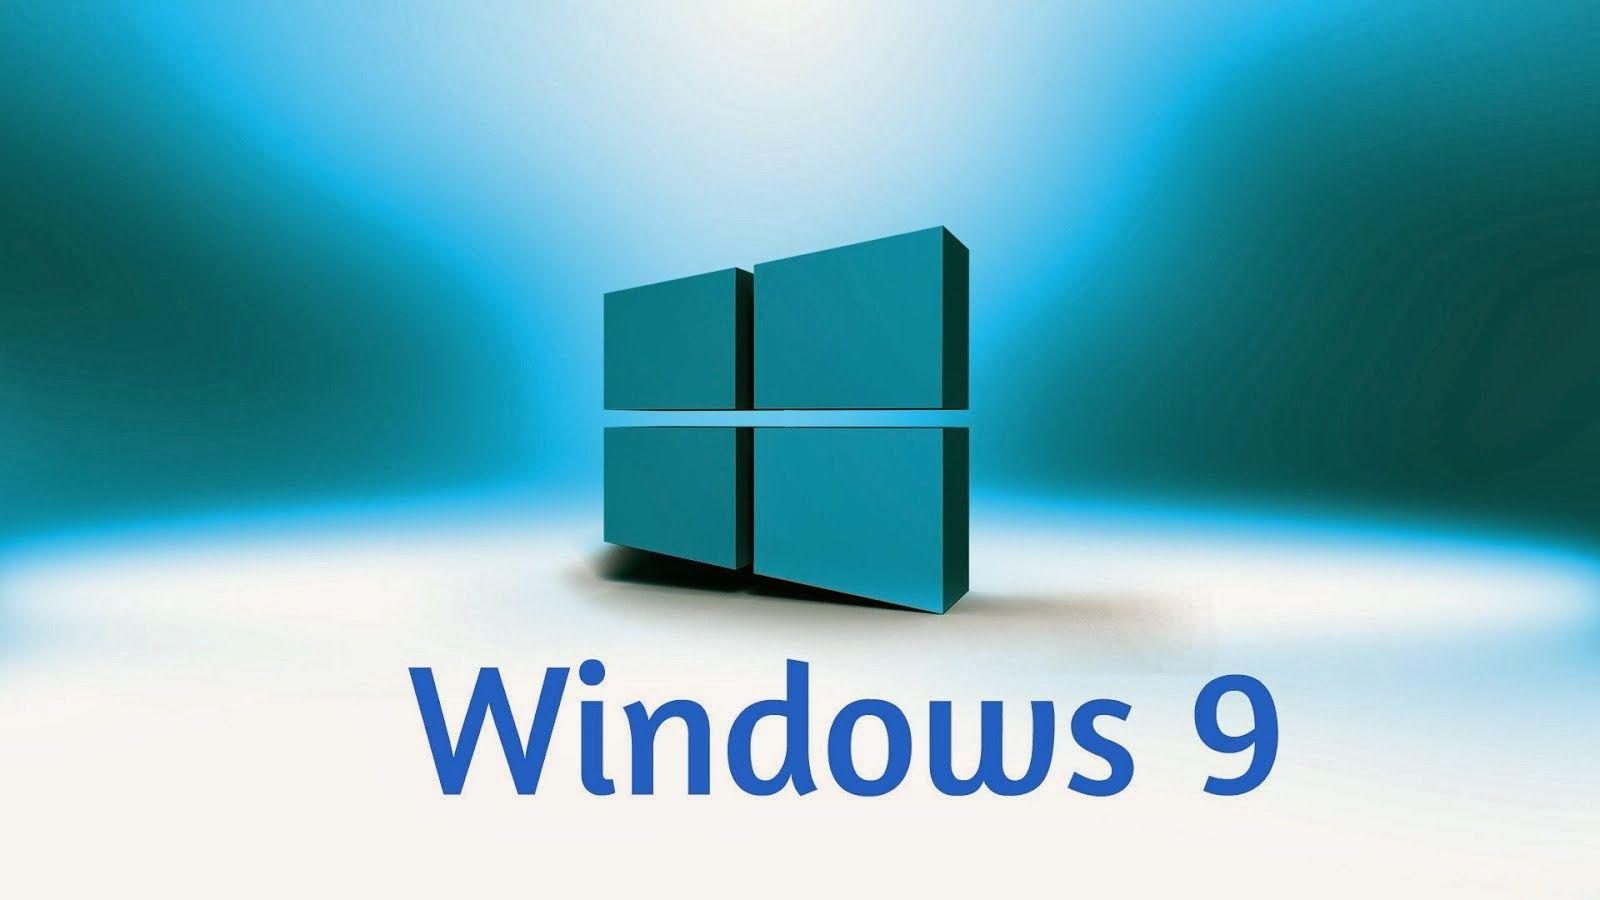 Windows 9 Computer Wallpaper